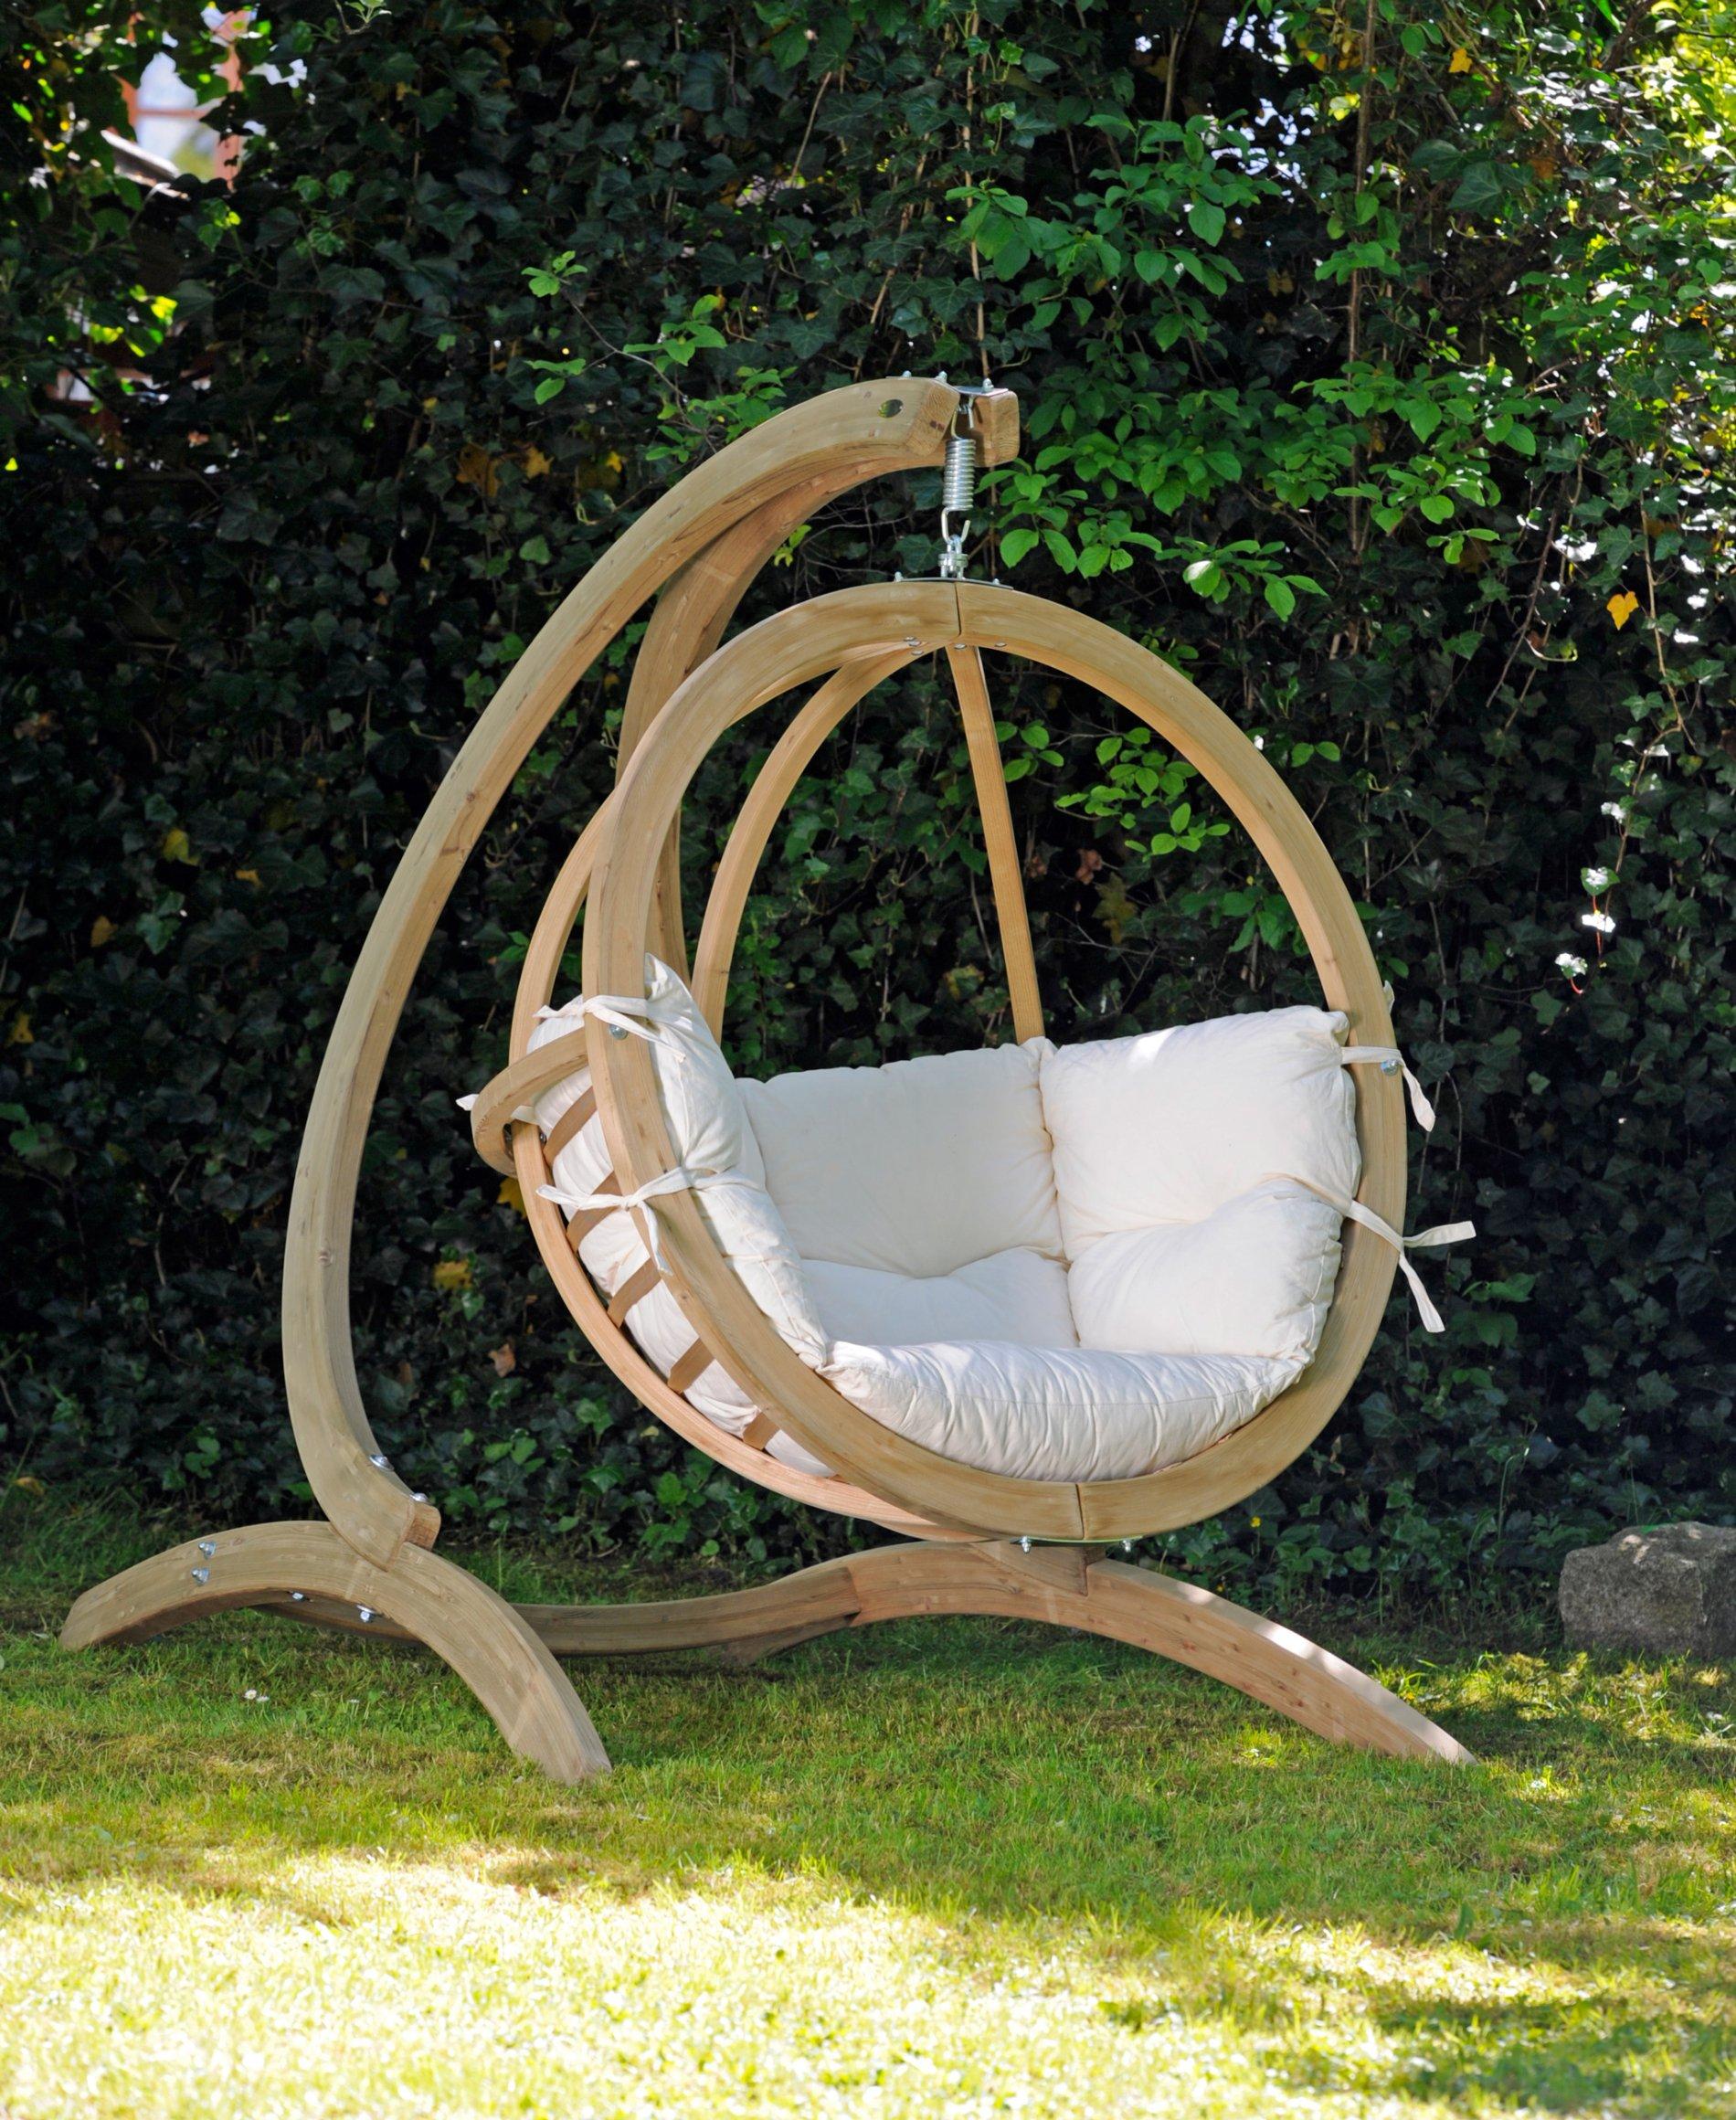 Globo Hangstoel Standaard.Stand For Globo Hanging Chair Webshop Swimmingpools Be